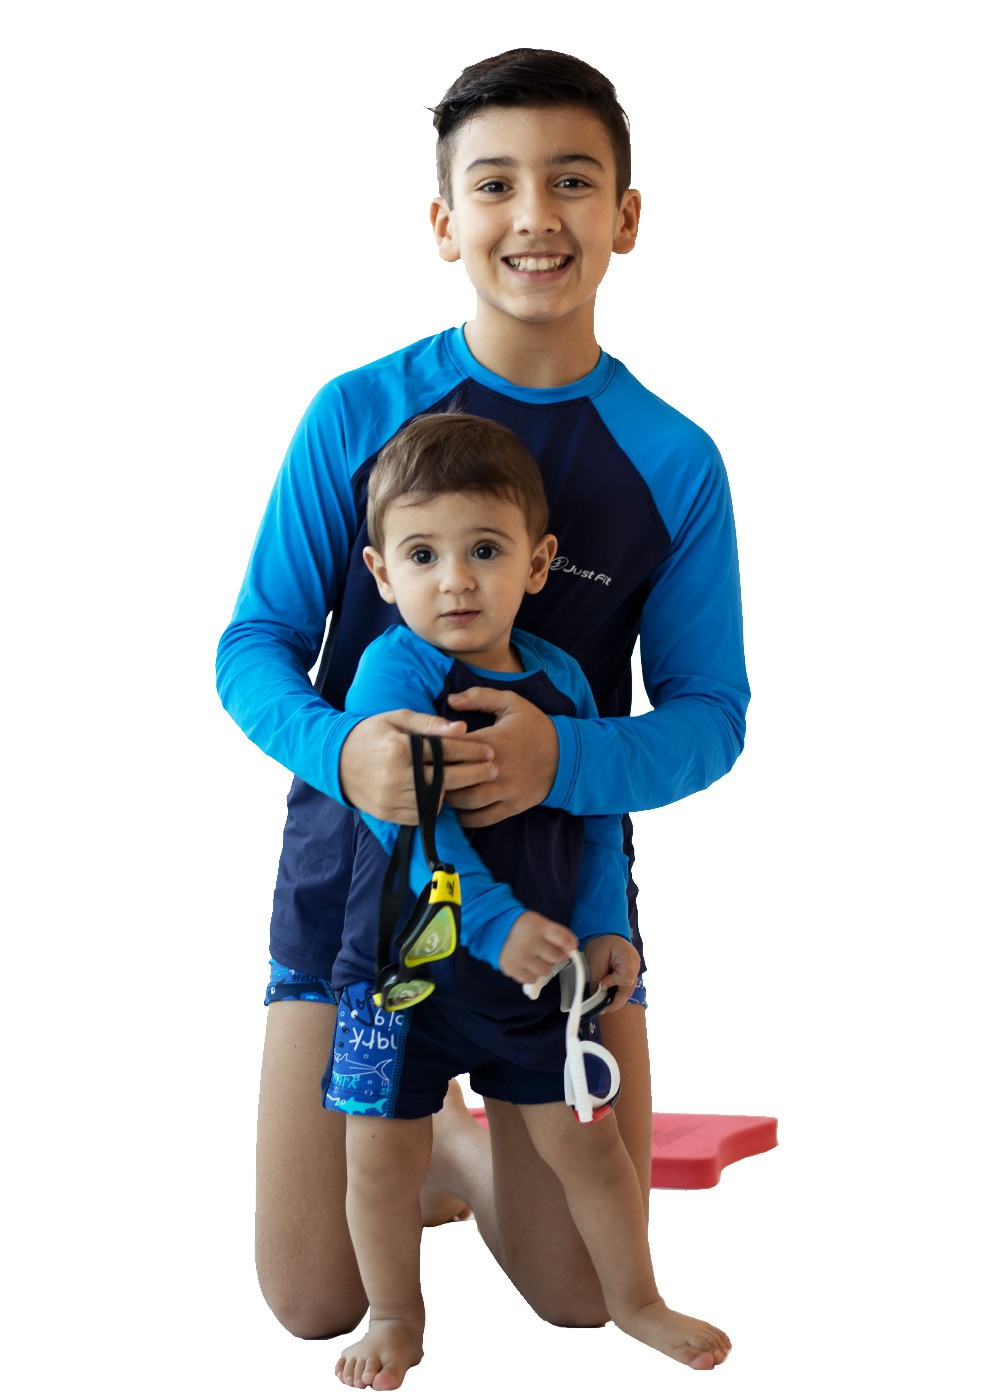 CAMISETA UV PROTECTION INFANTIL MANGA LONGA RAGLAN - MARINHO/AZUL FLÚOR